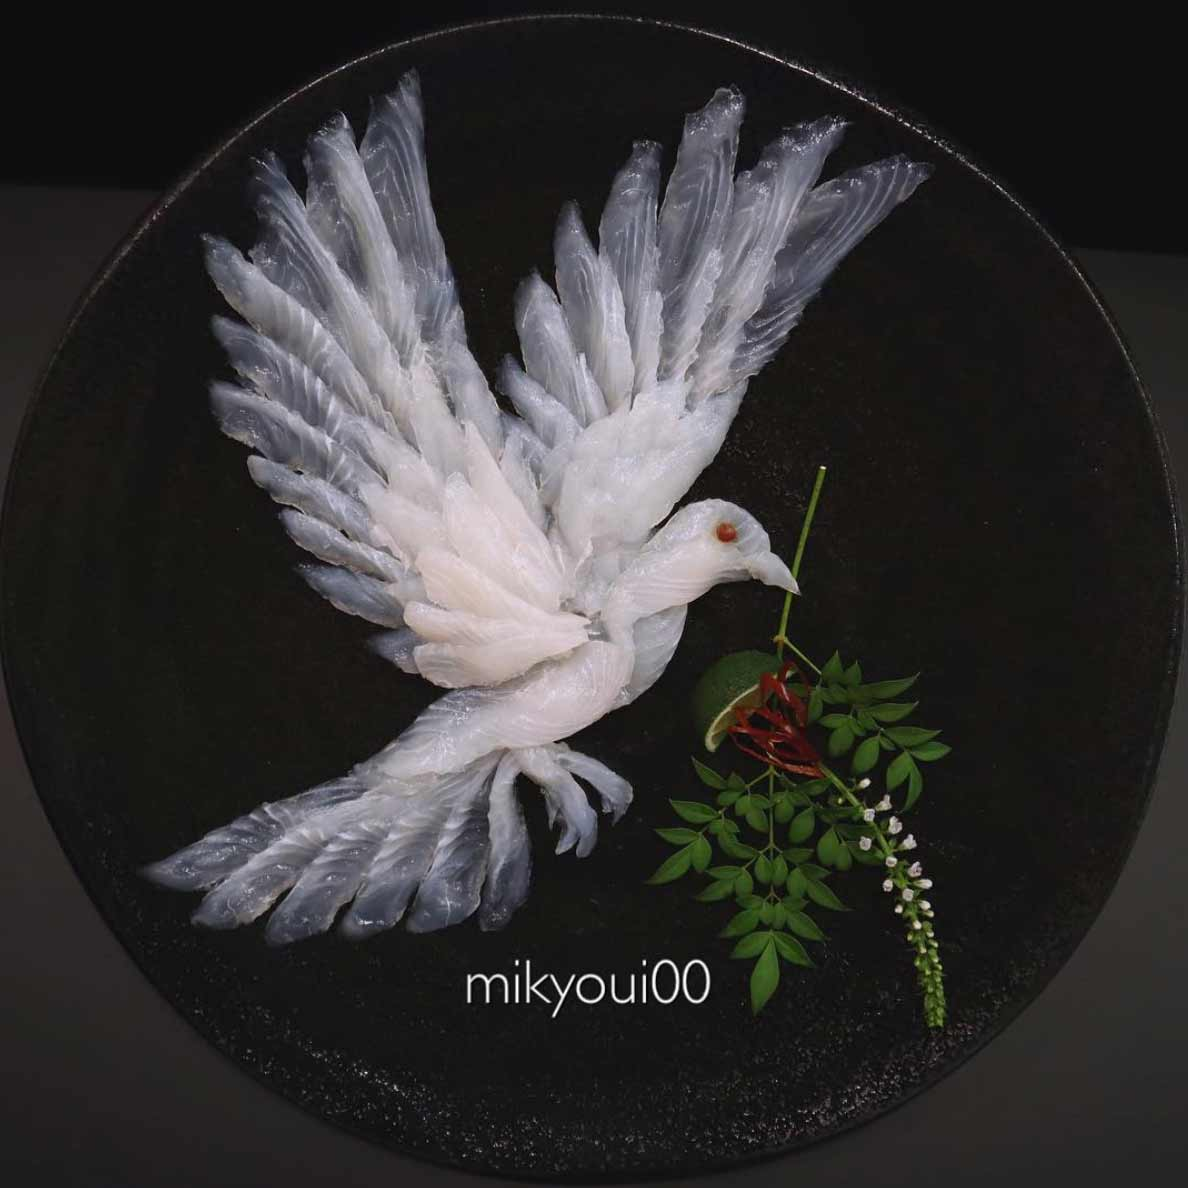 Wundervolle Sashimi-Kunstwerke von mikyou mikyou-sashimi-art-sushi-fischbilder_06